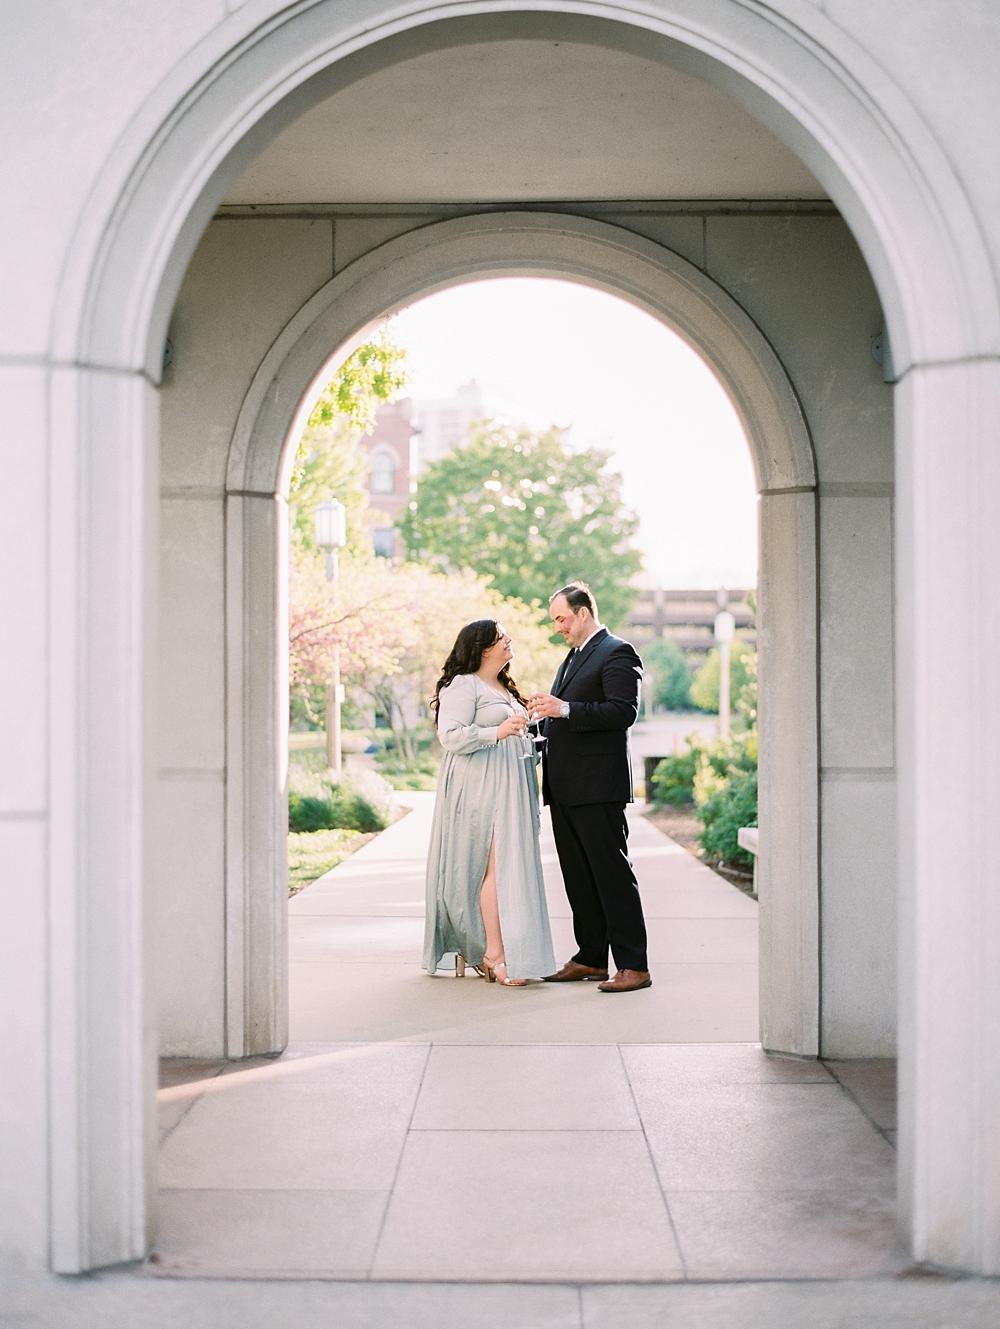 kristin-la-voie-photography-chicago-wedding-photographer-loyola-engagement-28